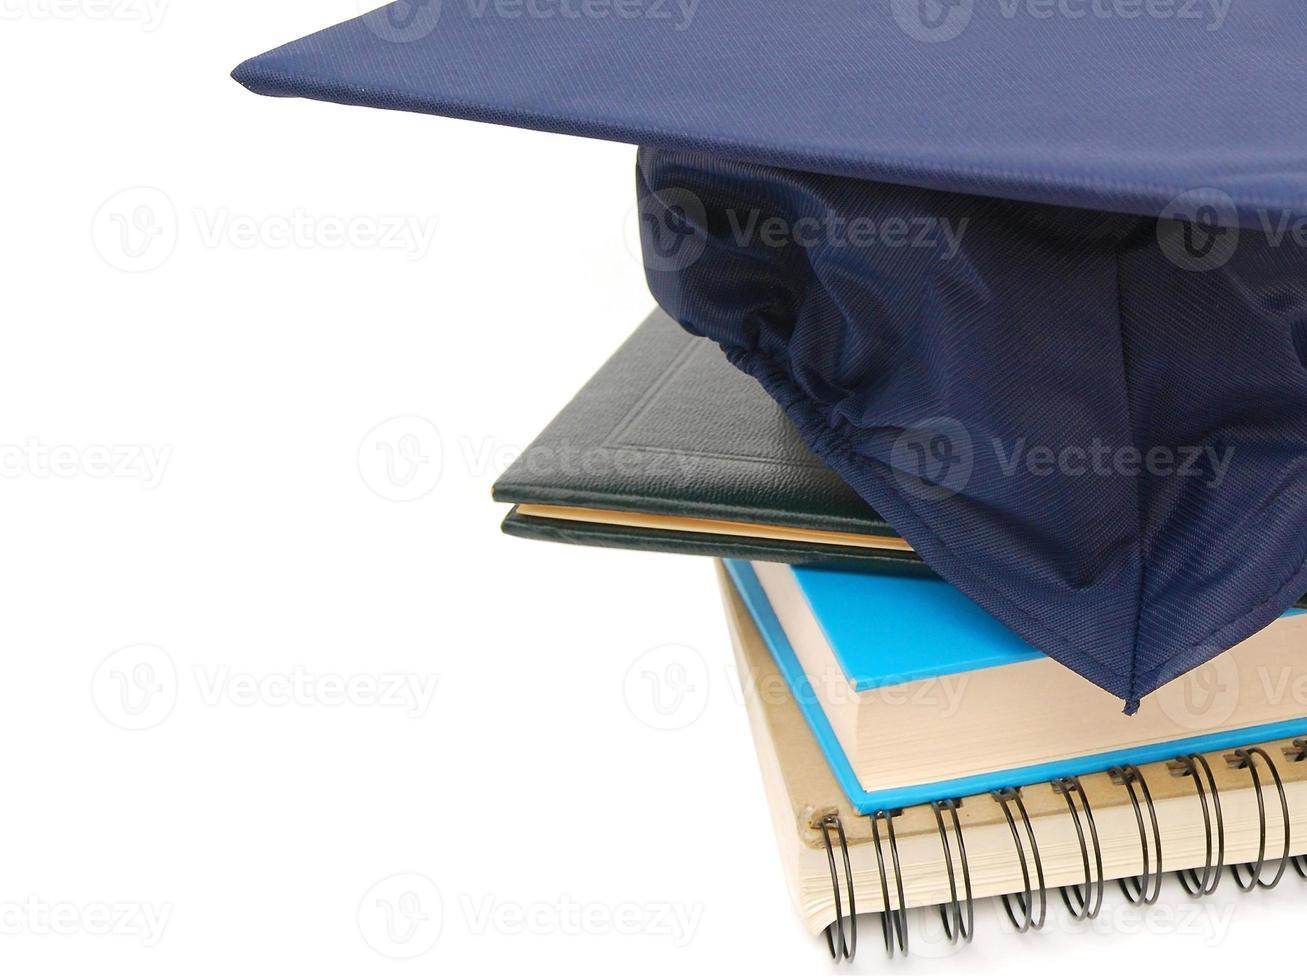 completando la laurea foto